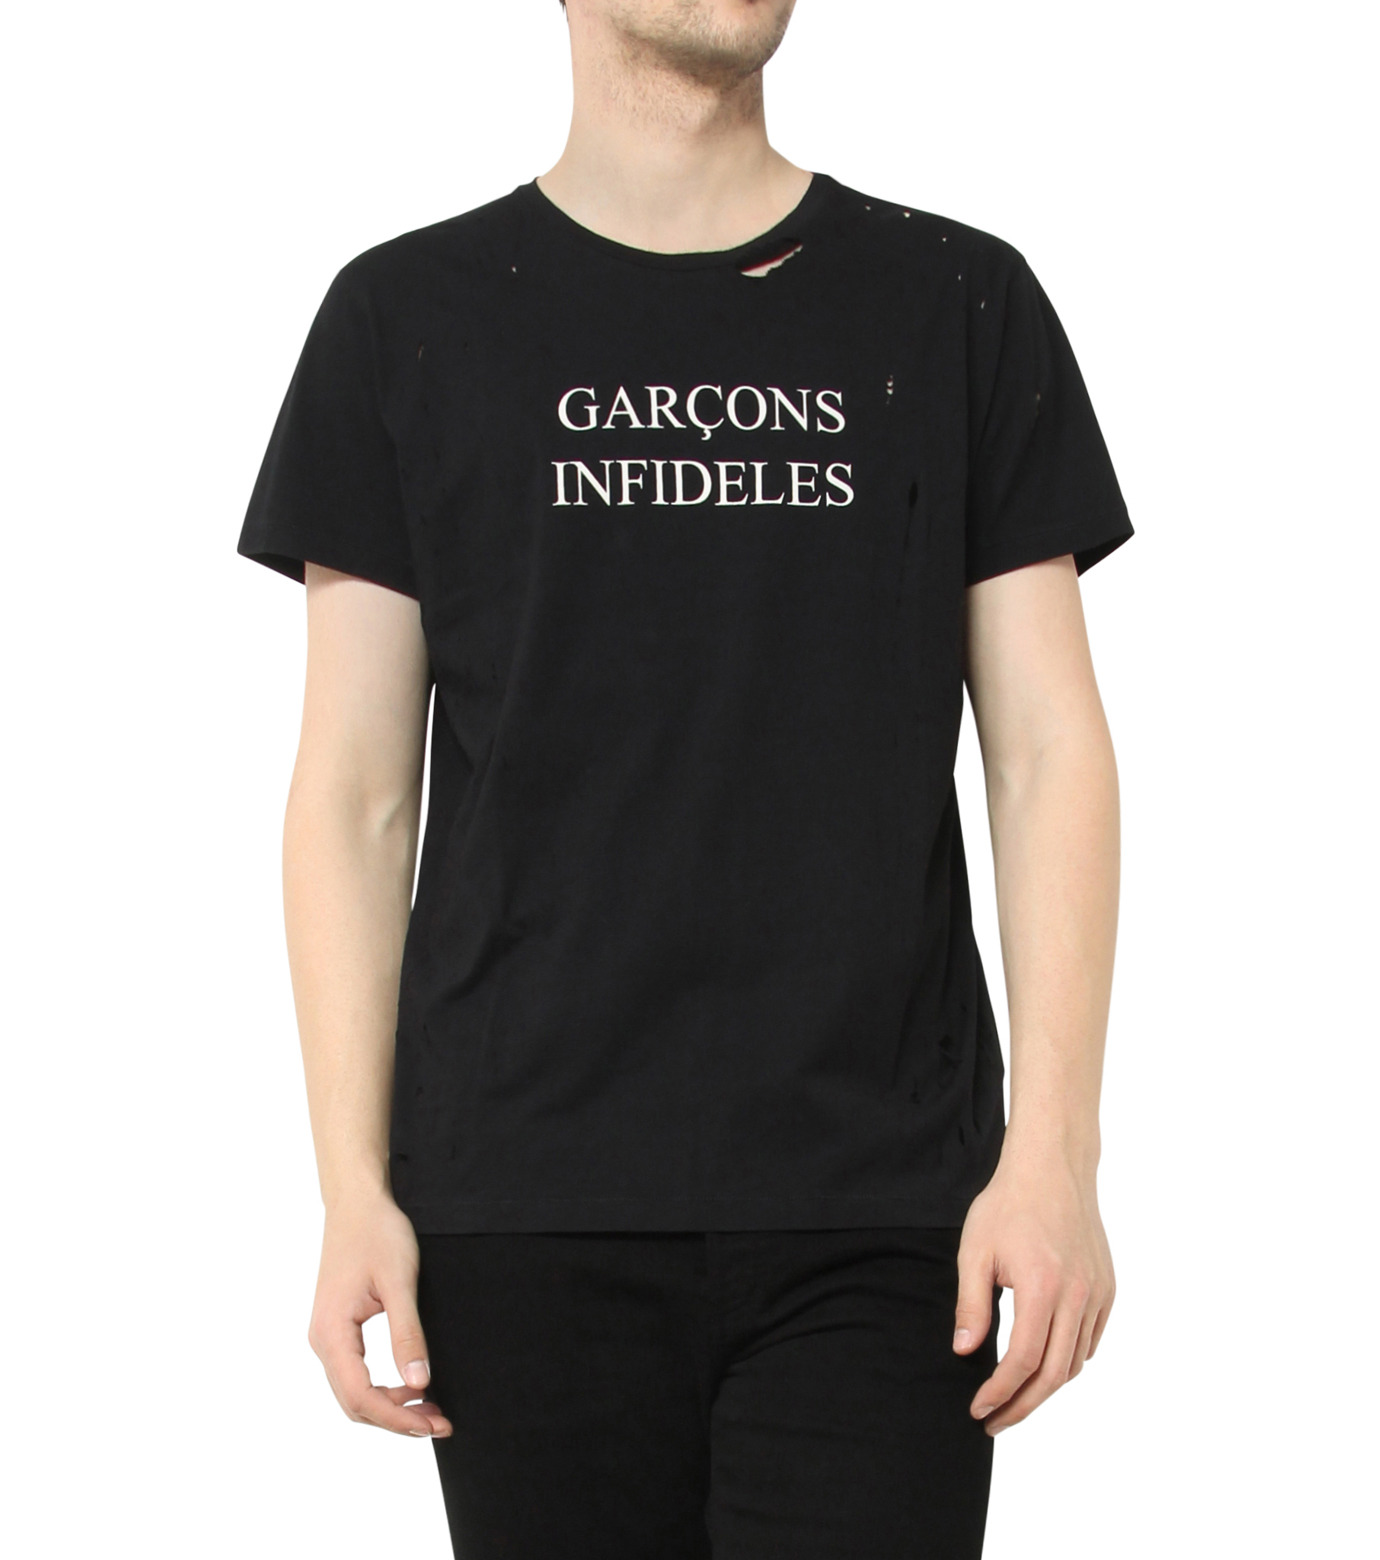 GARCONS INFIDELES(ギャルソン・インフィデレス)のLogo T-BLACK(CUT-SAWS/CUT-SAWS)-SID-13 拡大詳細画像1